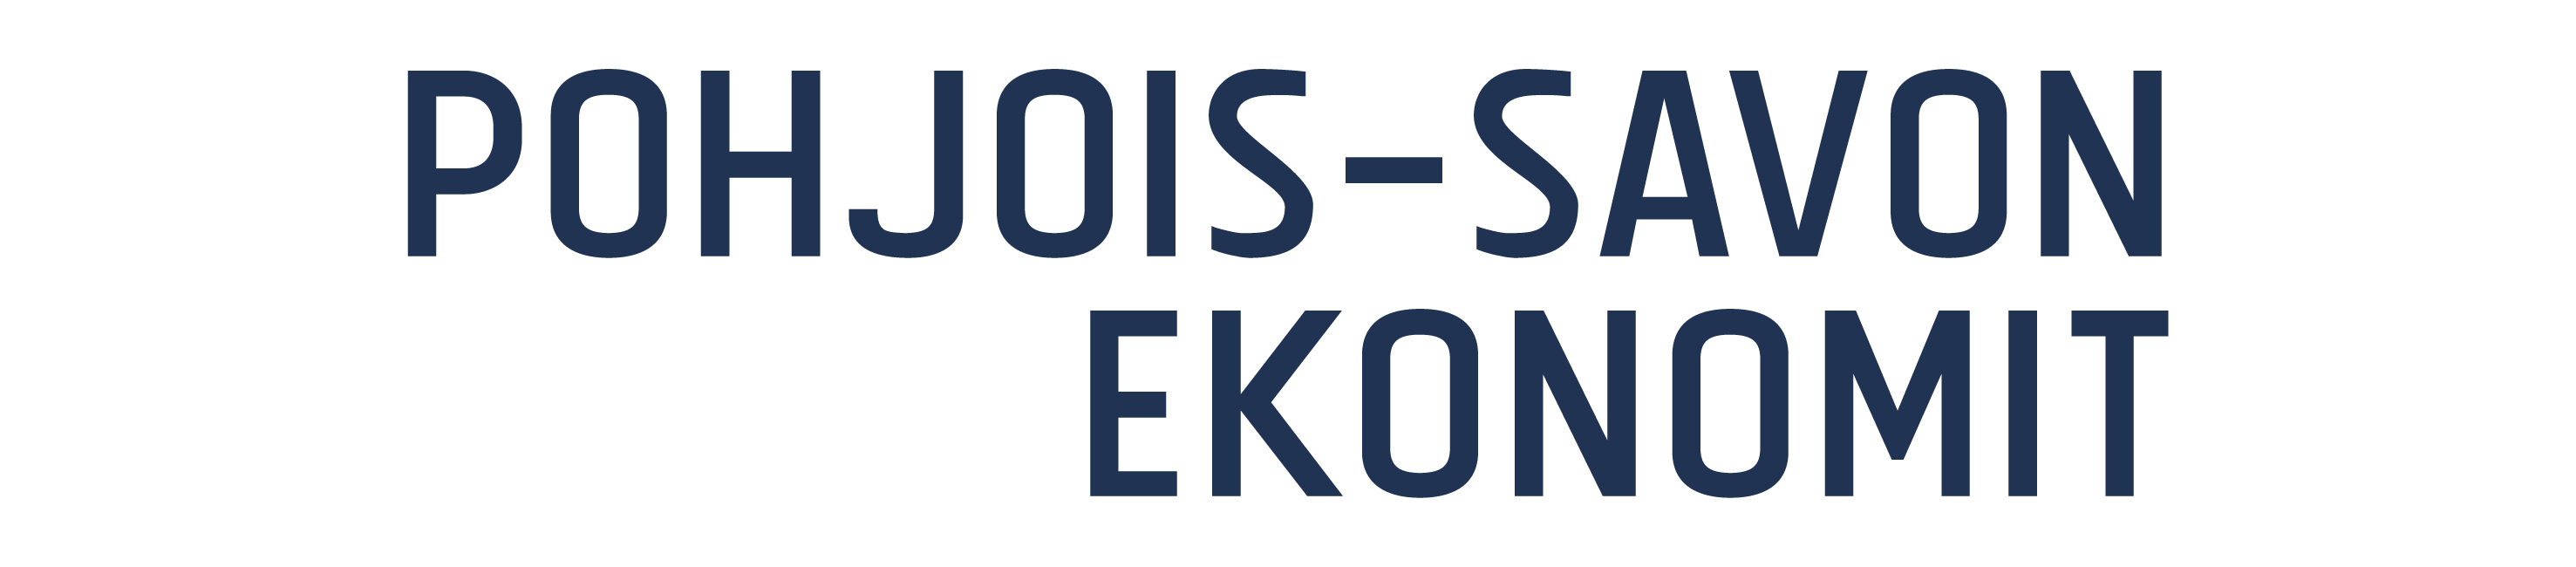 Pohjois-Savon Ekonomit